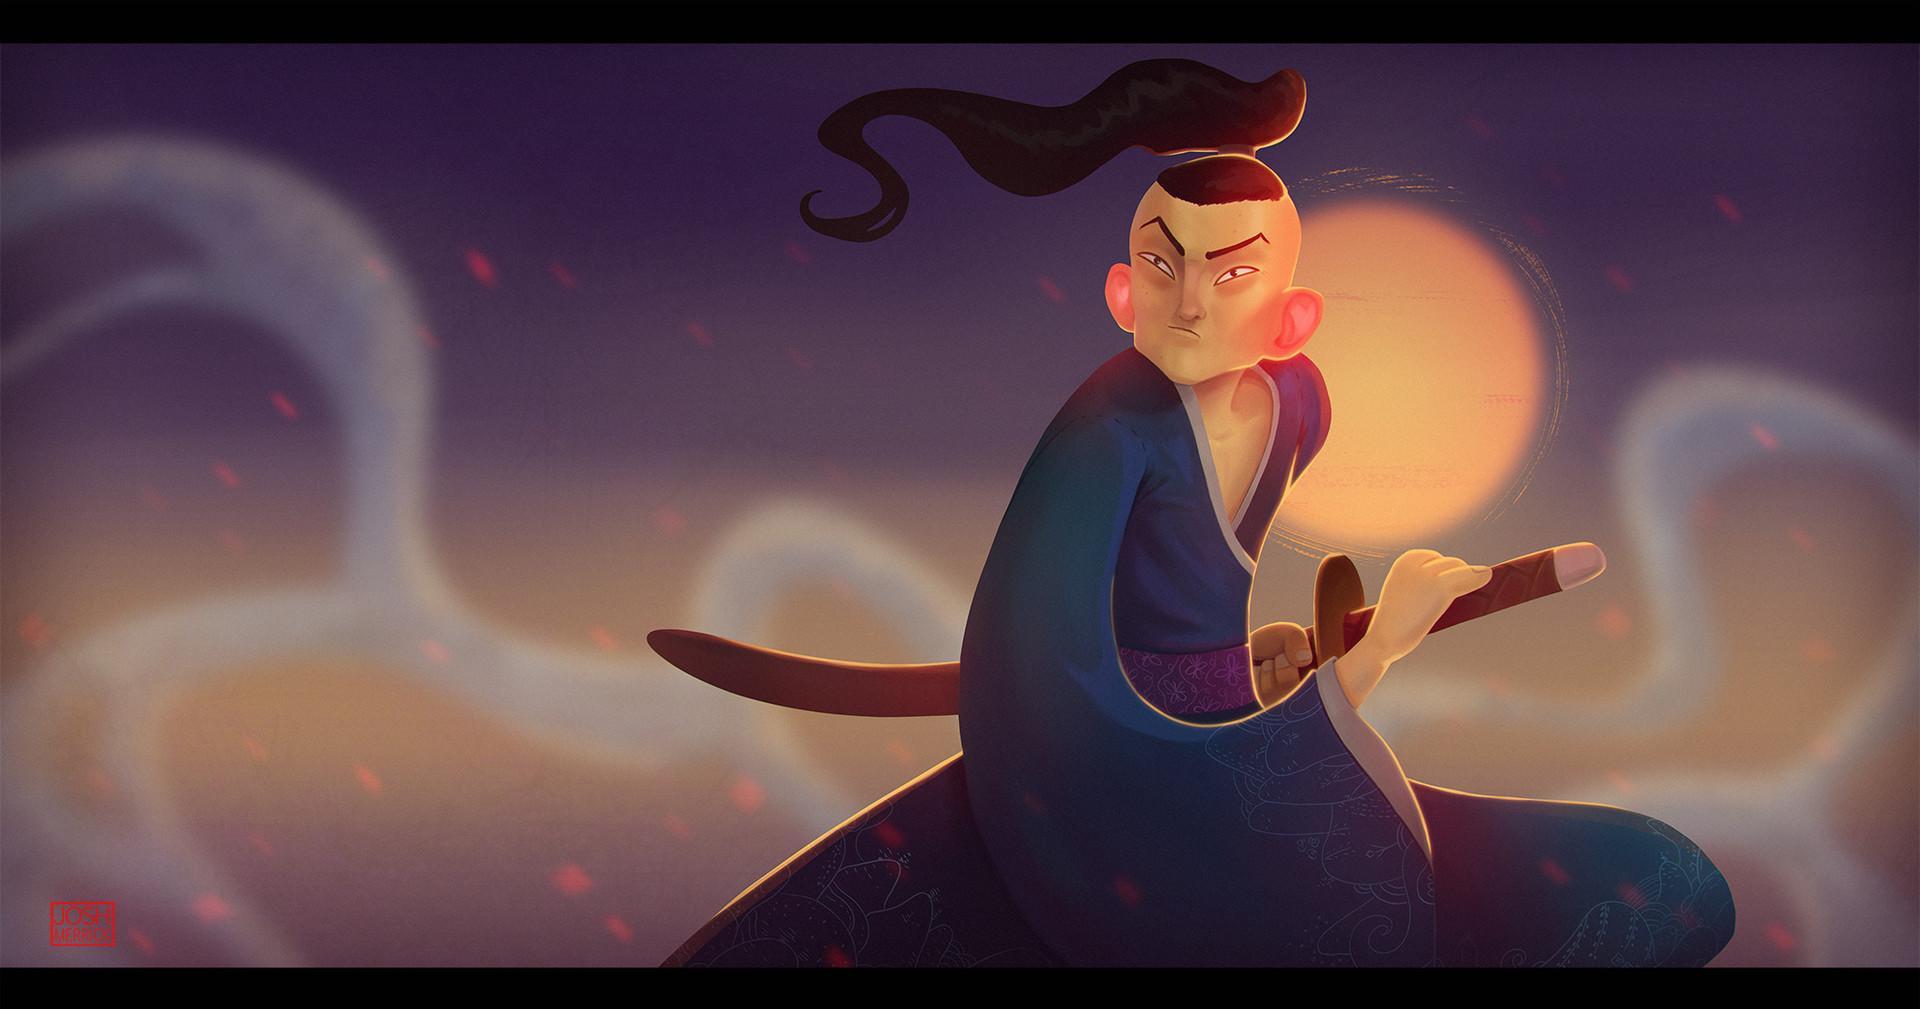 Josh merrick samurai3